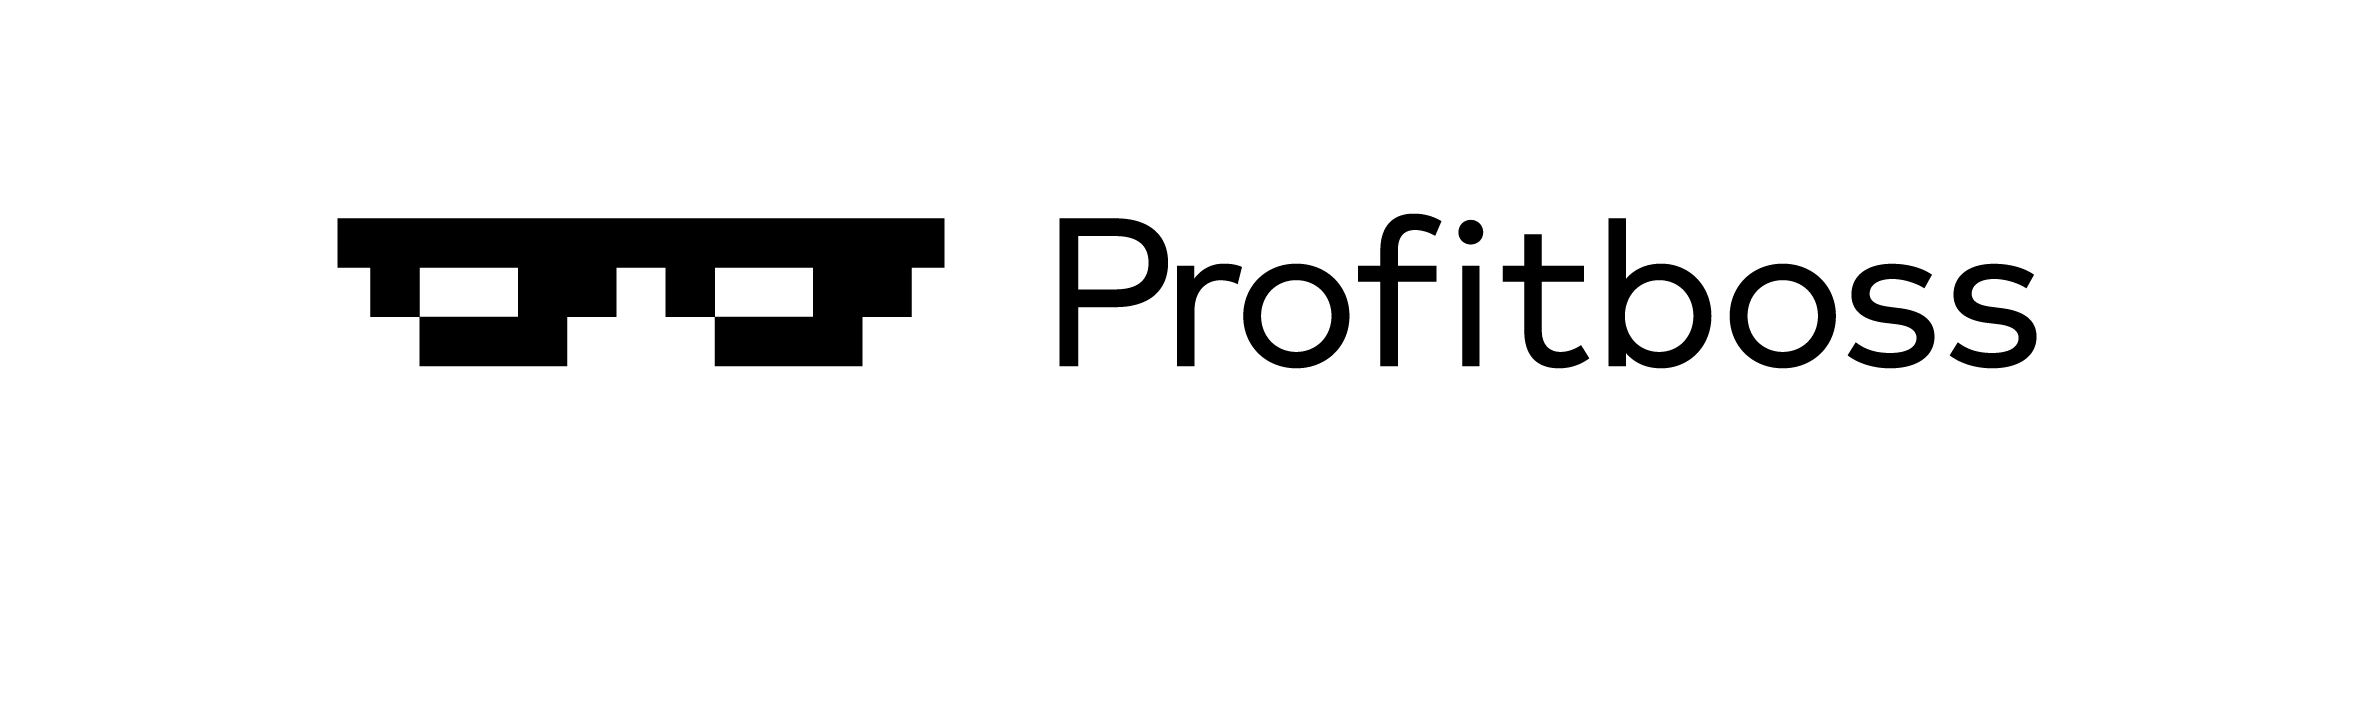 Profitboss logo